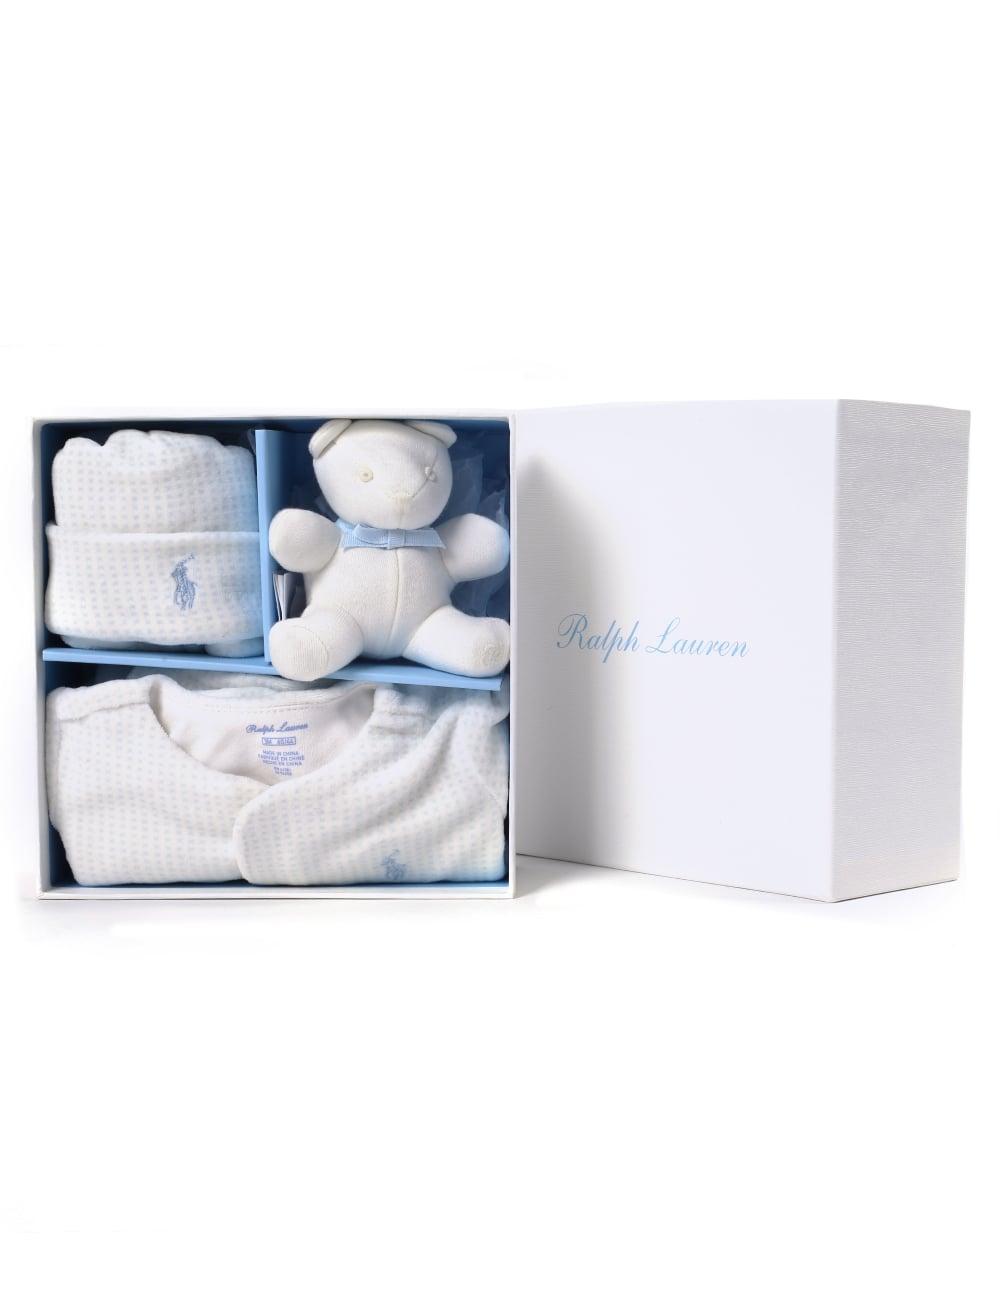 9ab0b76e5 Polo Ralph Lauren Baby Boy 3 Piece Gift Box